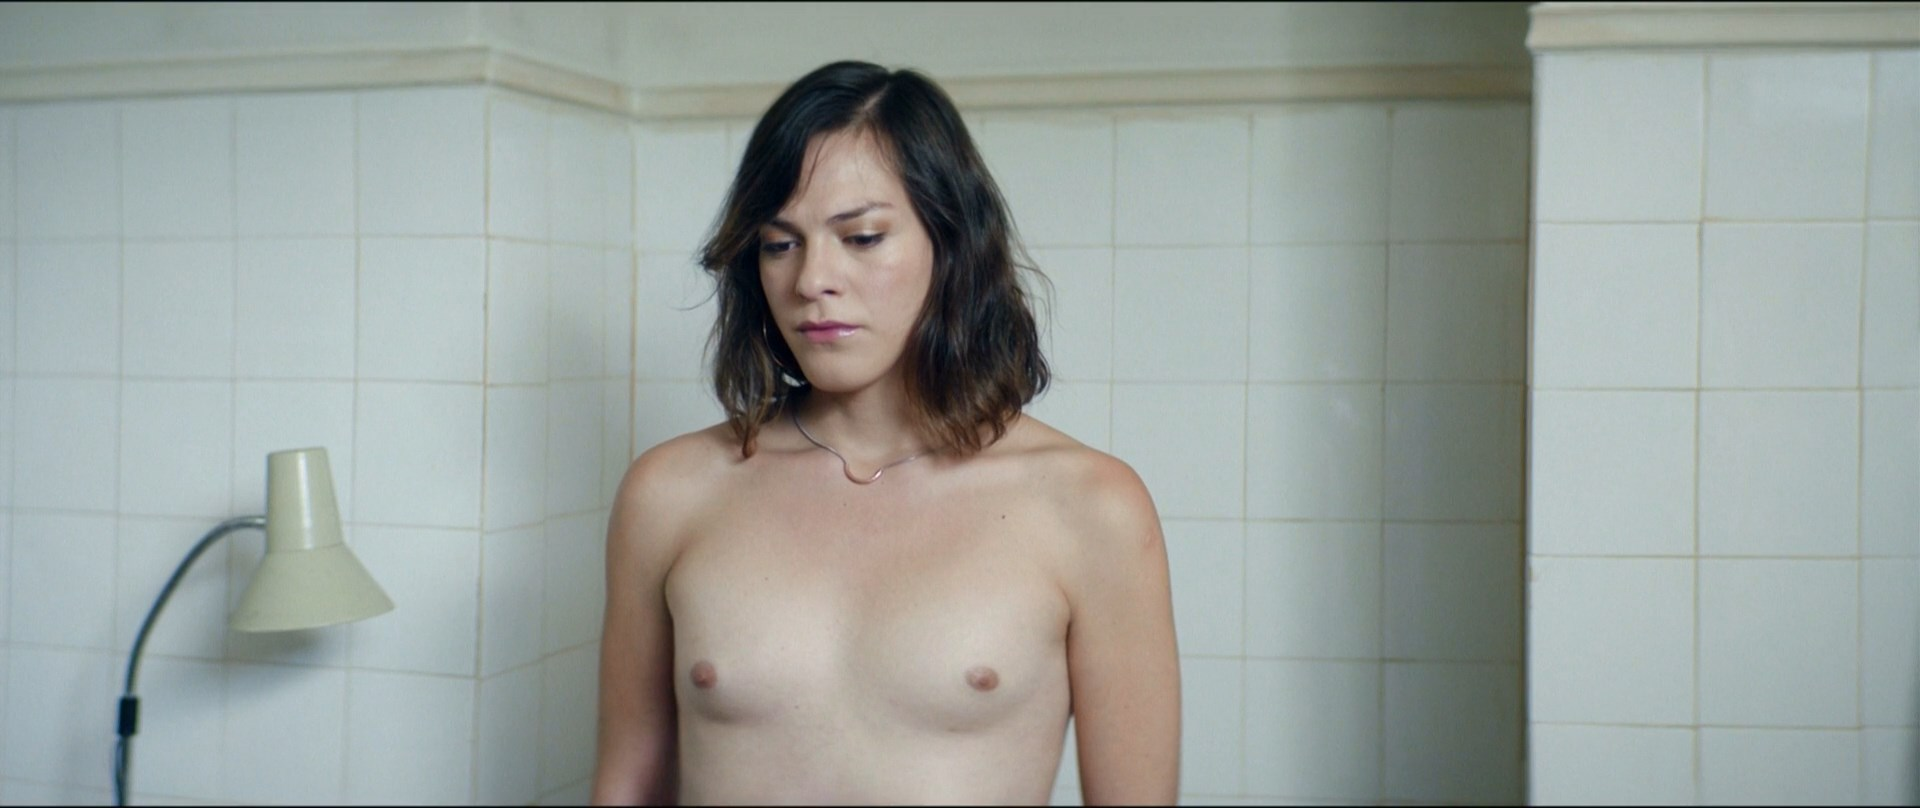 Daniela nackt Vega Corinna Nude